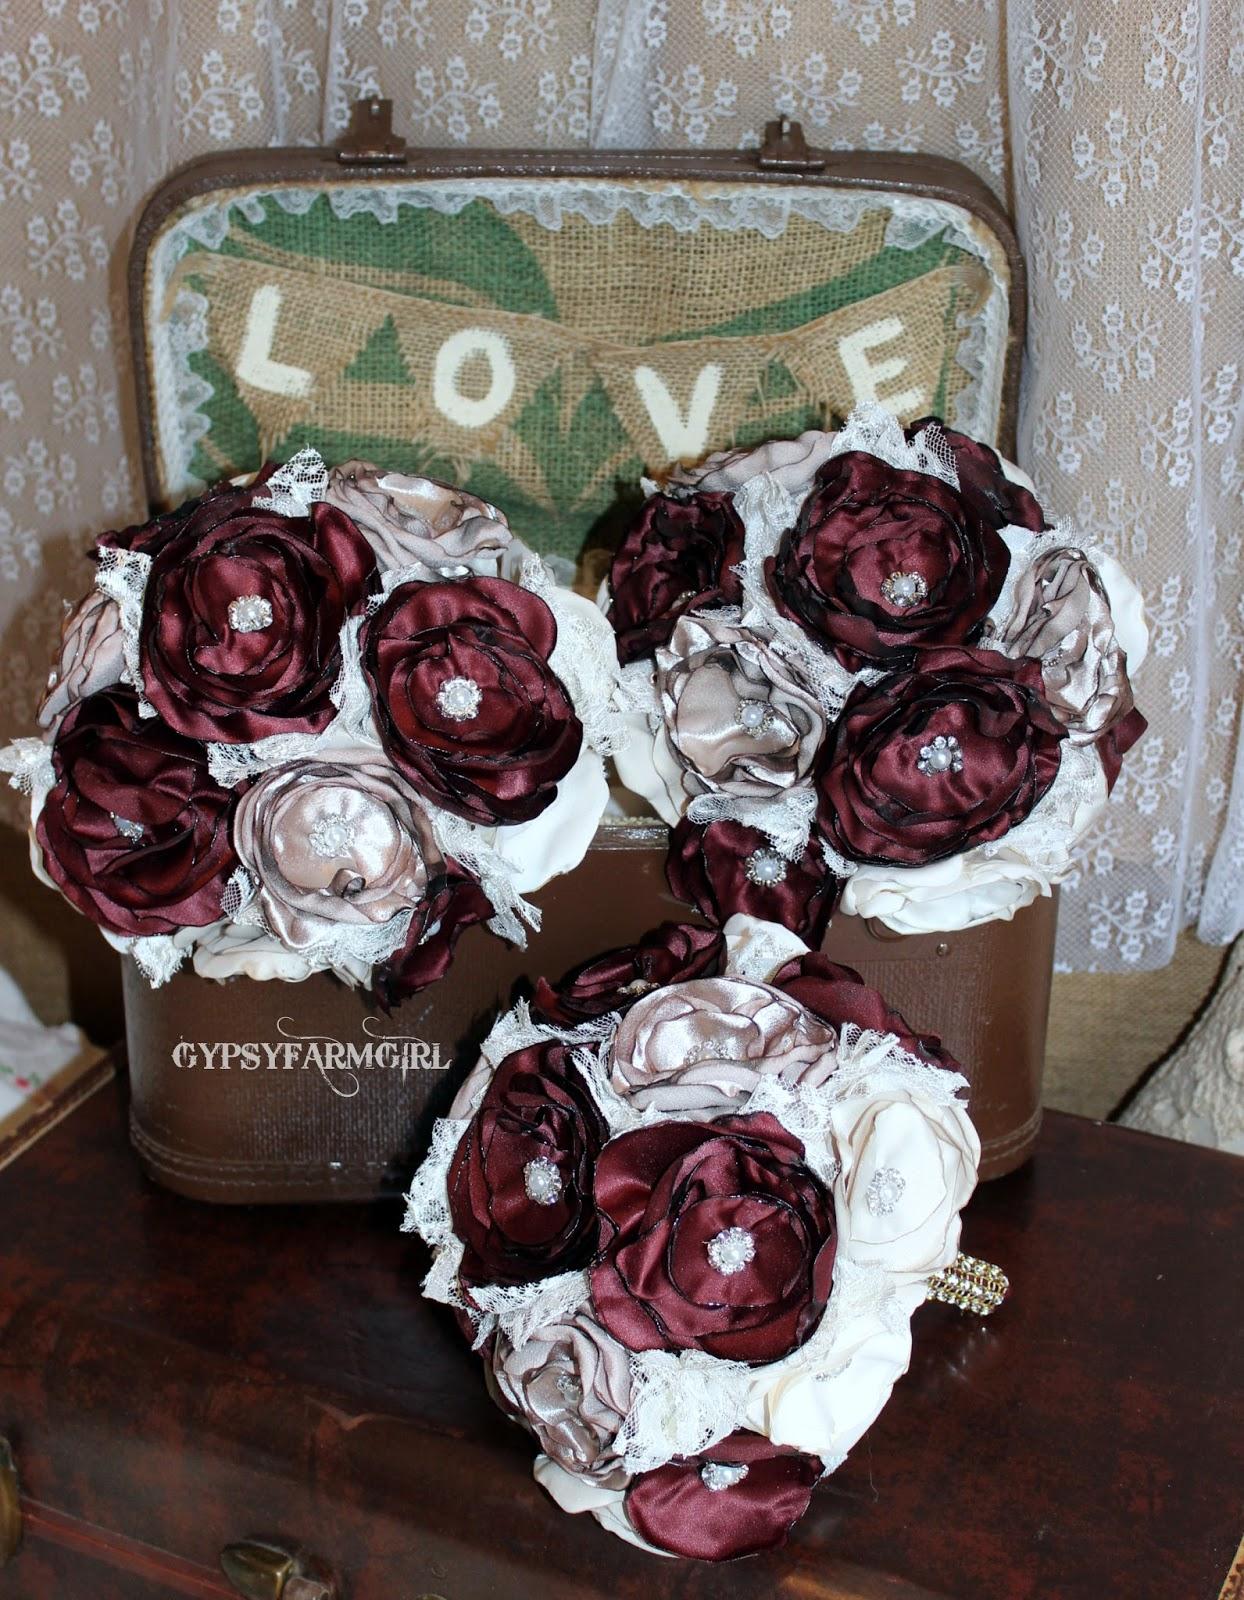 Gypsyfarmgirl vintage glam satin fabric wedding bouquets wine satin fabric wedding bouquets satin flower bridesmaid bouquets izmirmasajfo